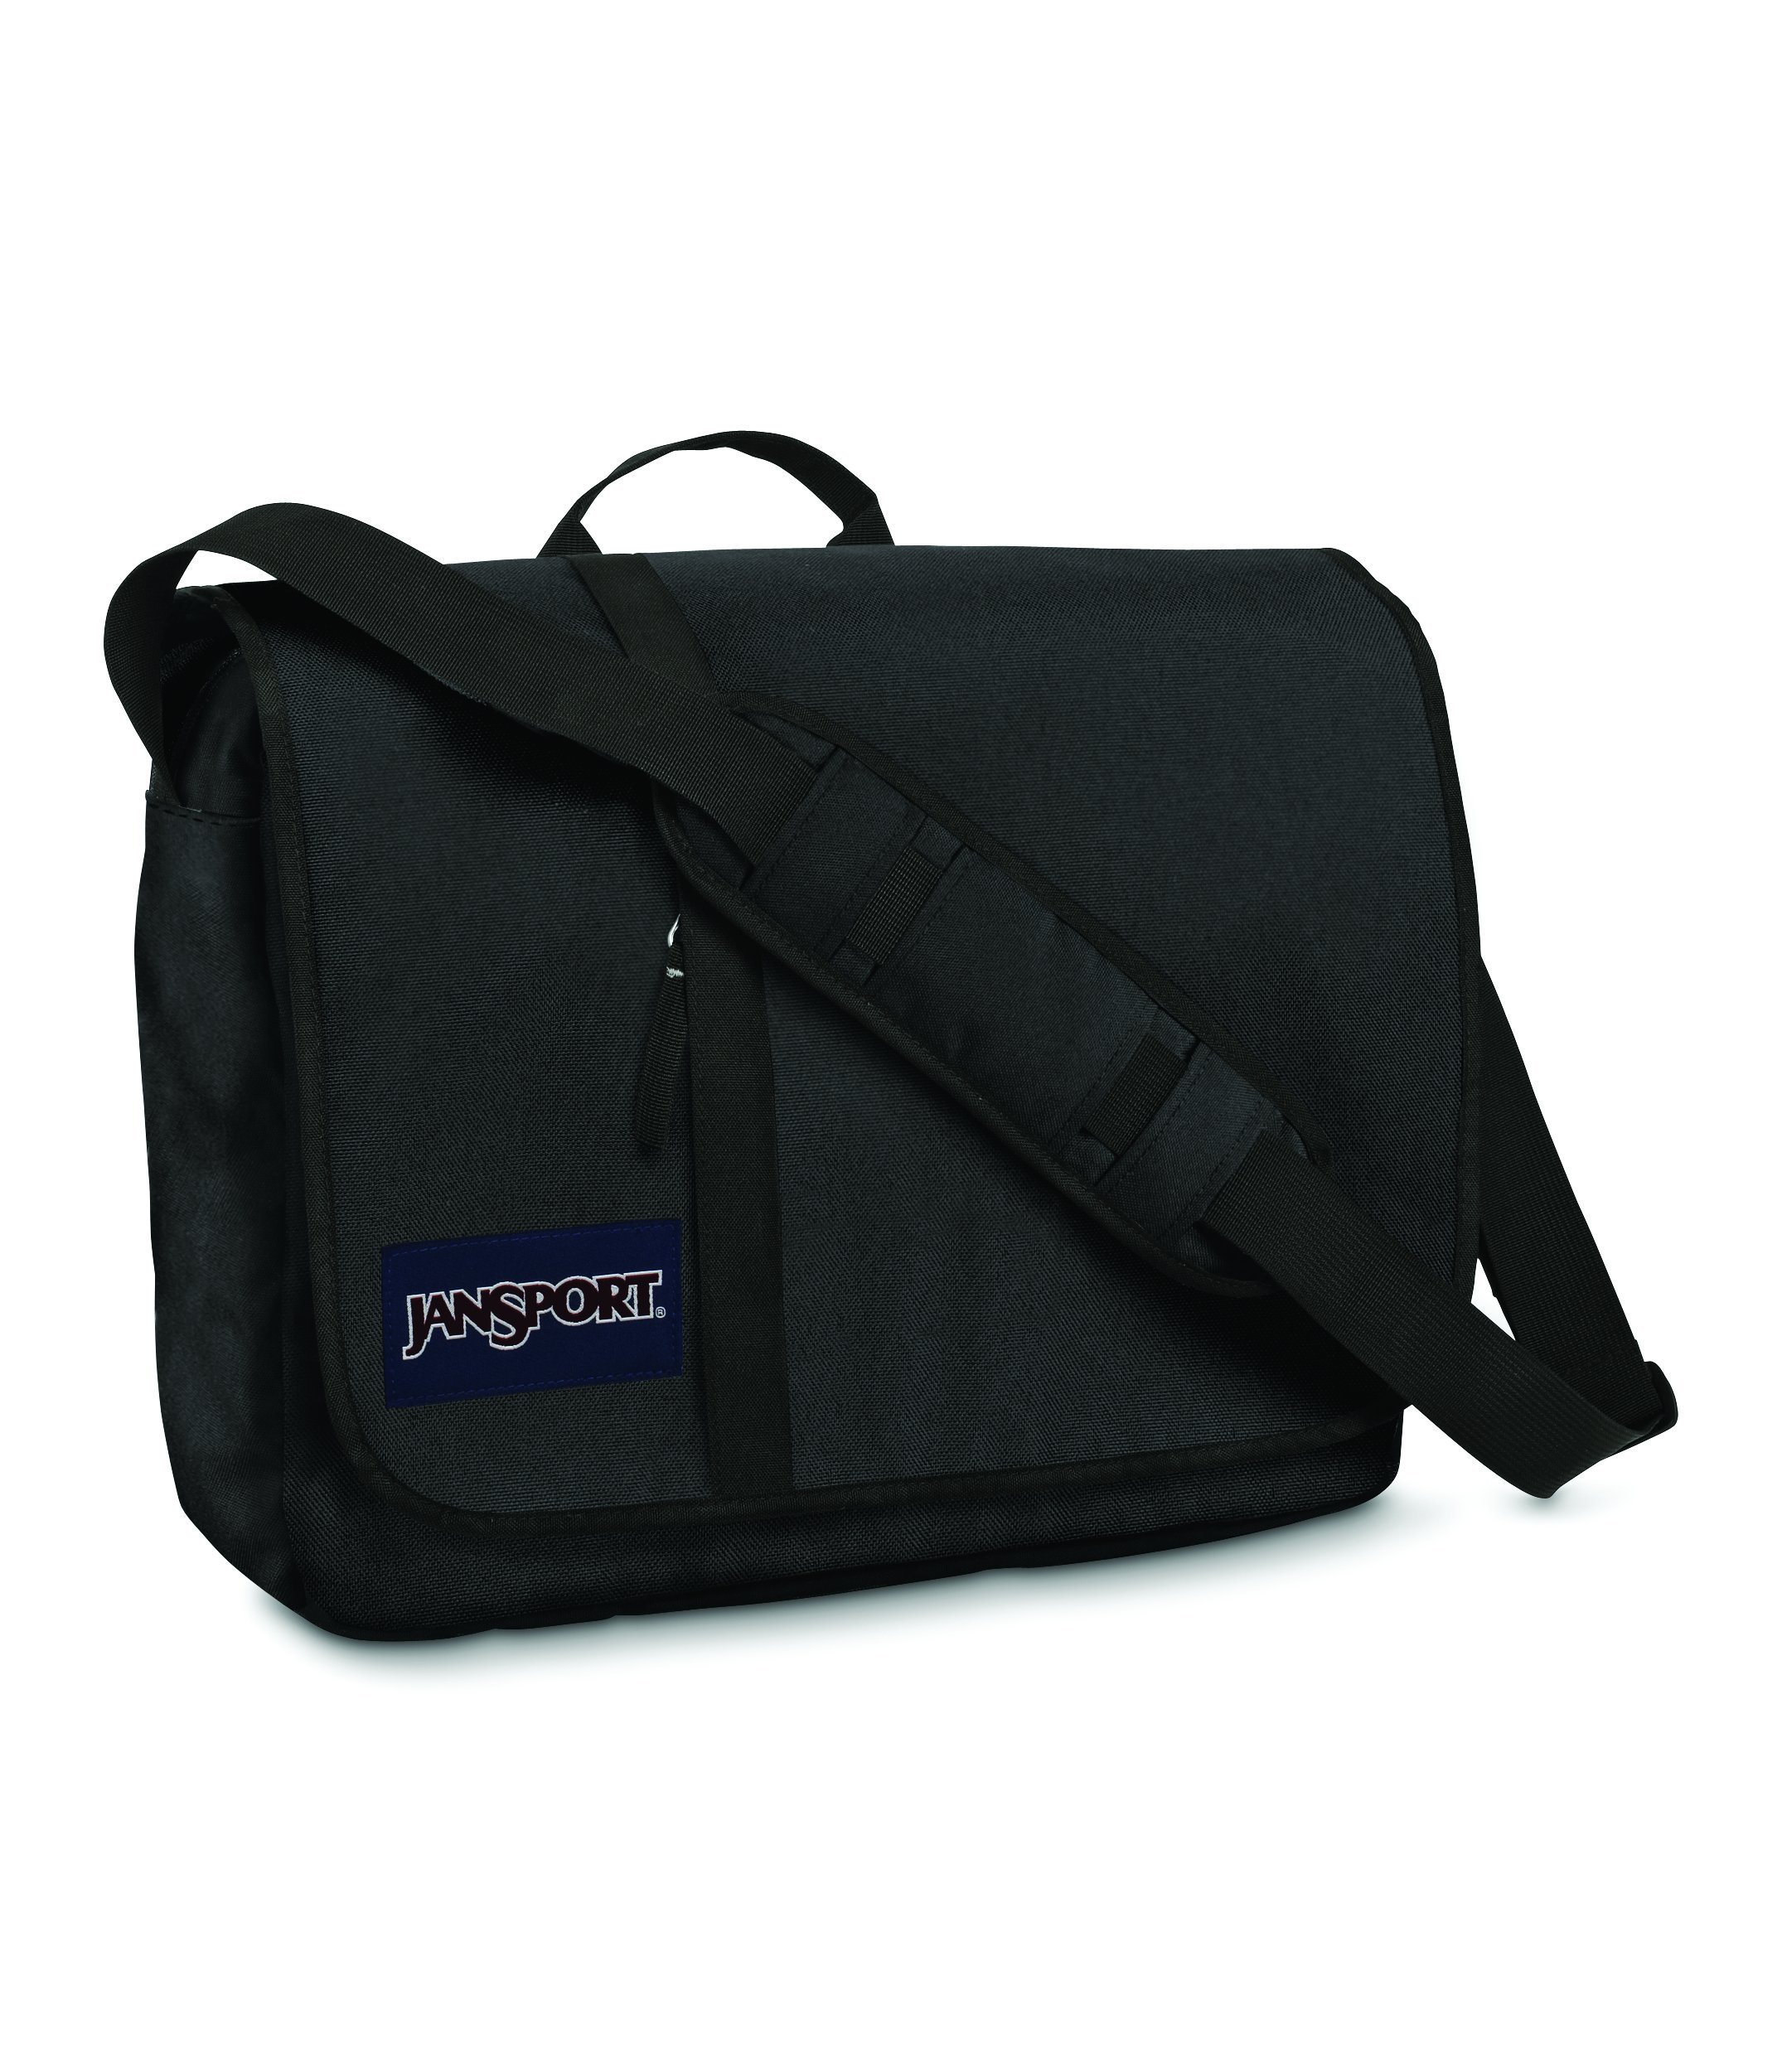 9d1a6e2c7897 JanSport Market Street Messenger Bag (Black)